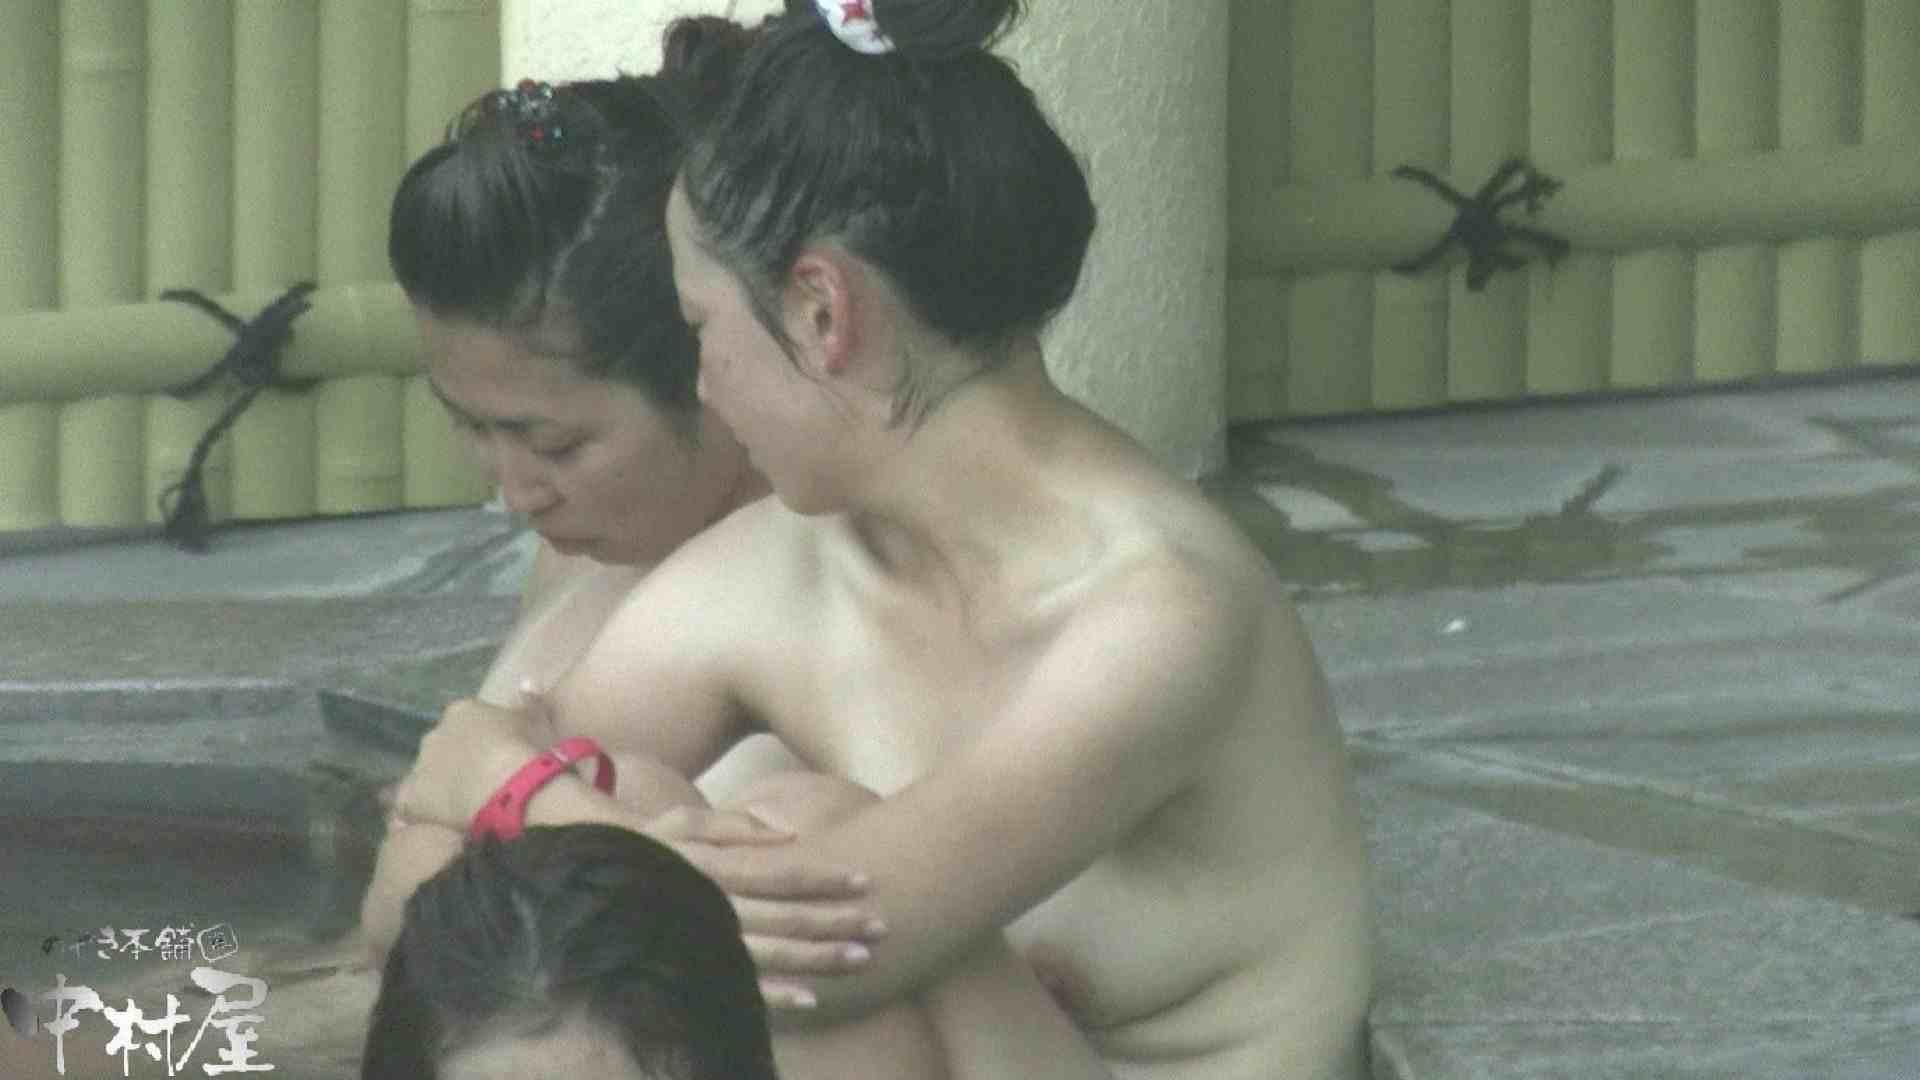 Aquaな露天風呂Vol.911 0  88連発 82